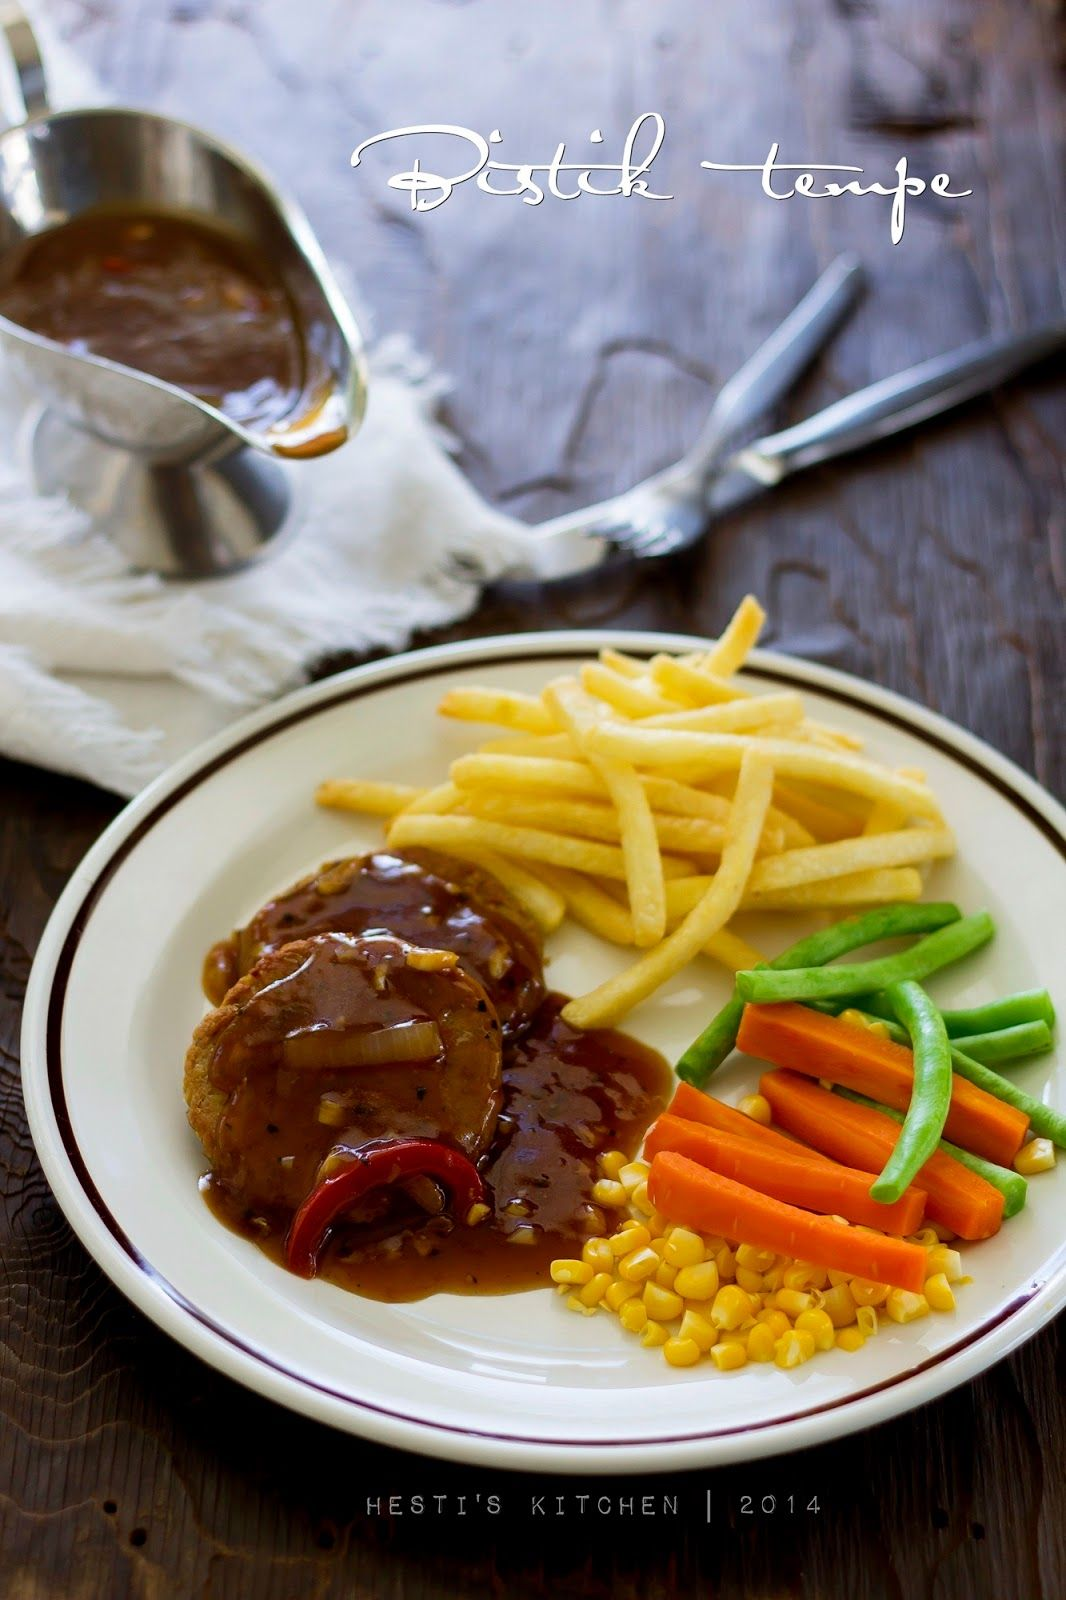 Hesti S Kitchen Yummy For Your Tummy Bistik Tempe Saus Lada Hitam Resep Steak Resep Makanan Sehat Makanan Diet